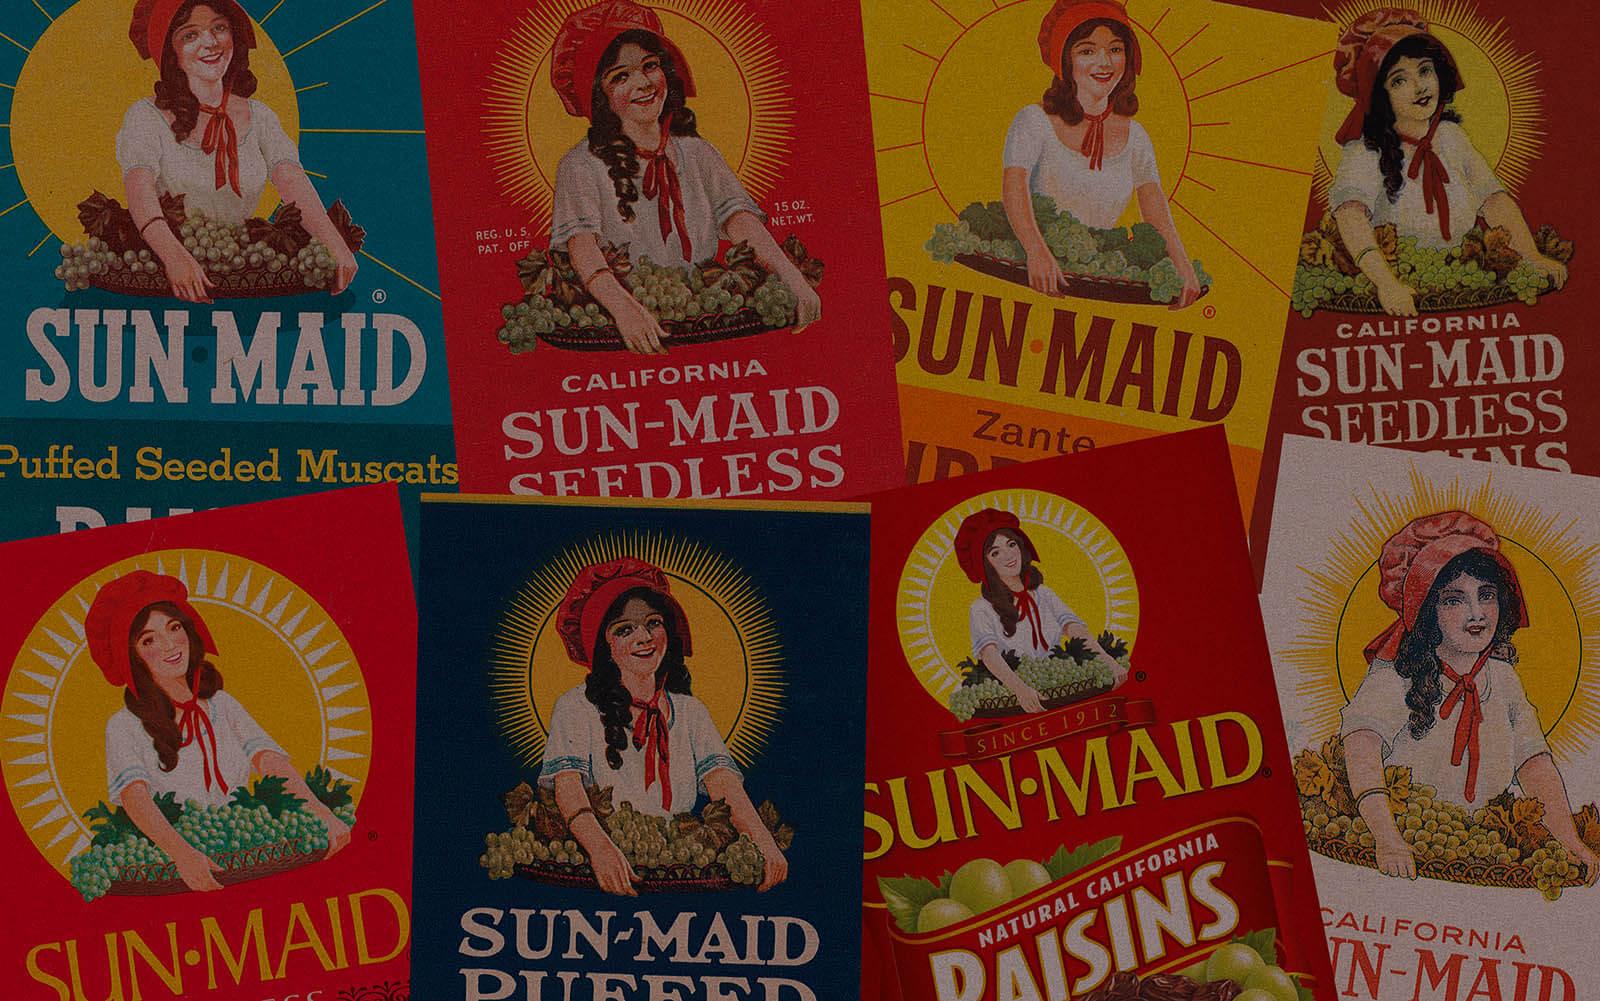 Sun-Maid labels